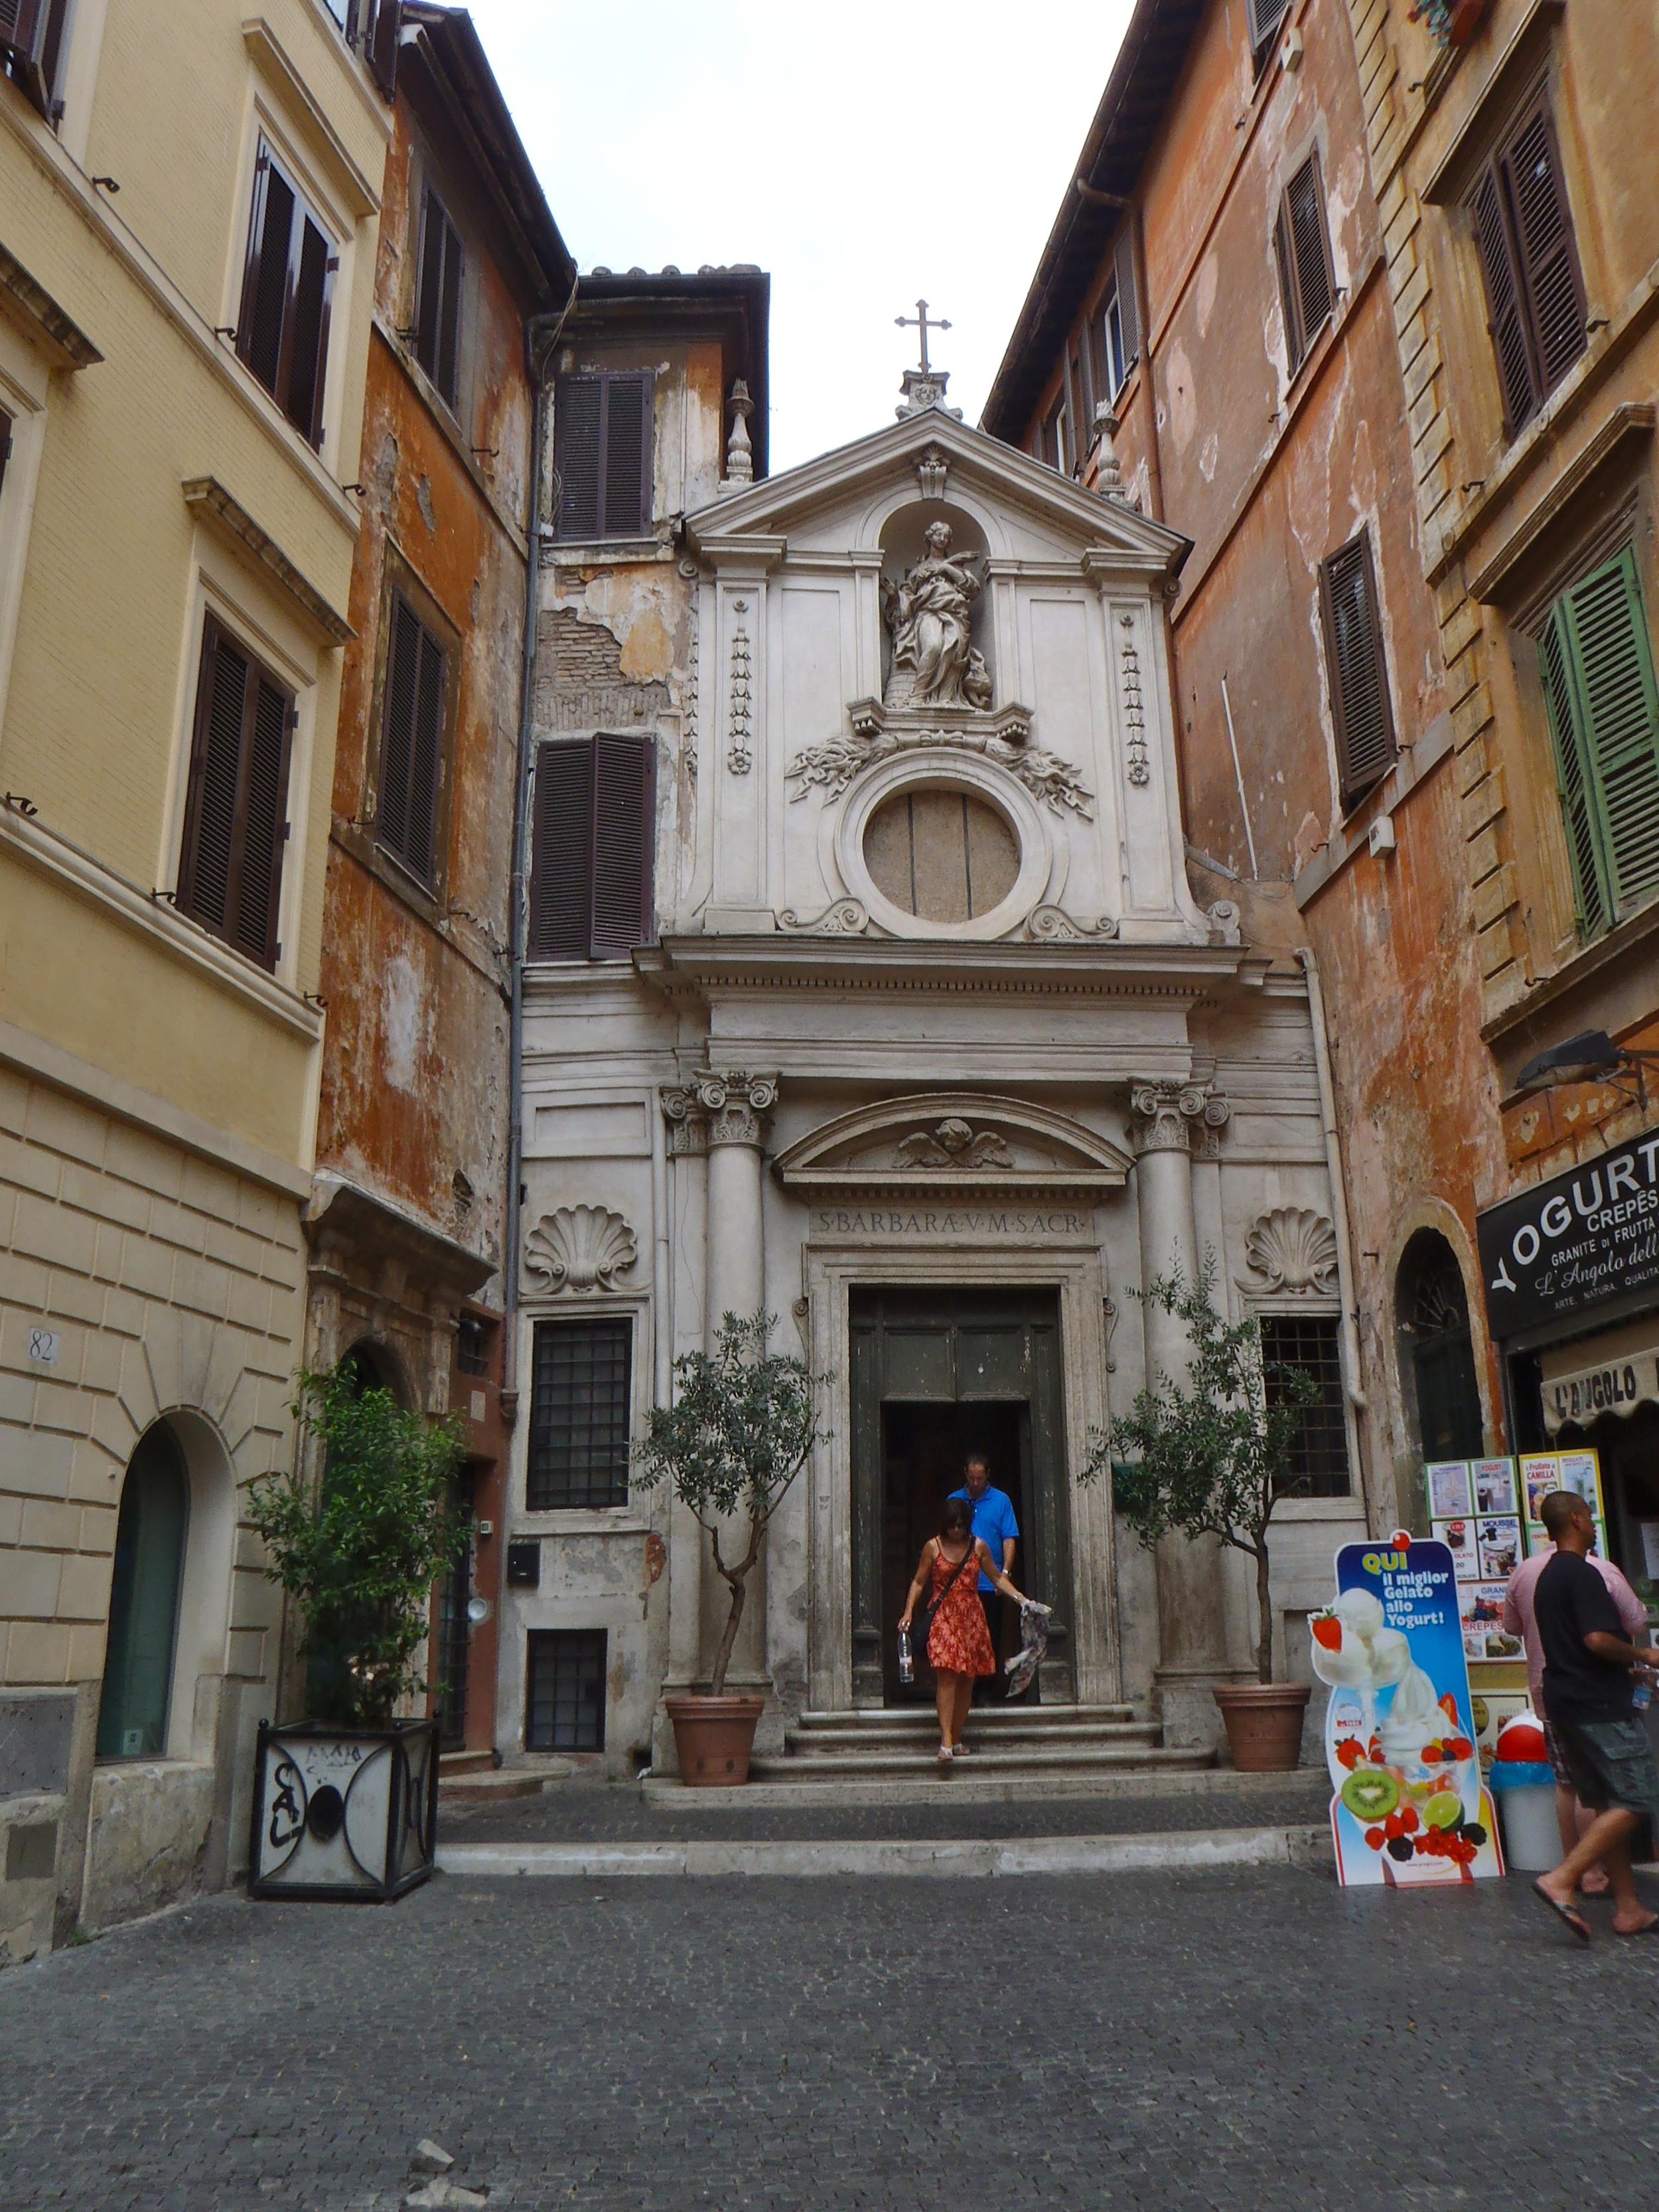 CRO Italy web 2012 - 46.jpg